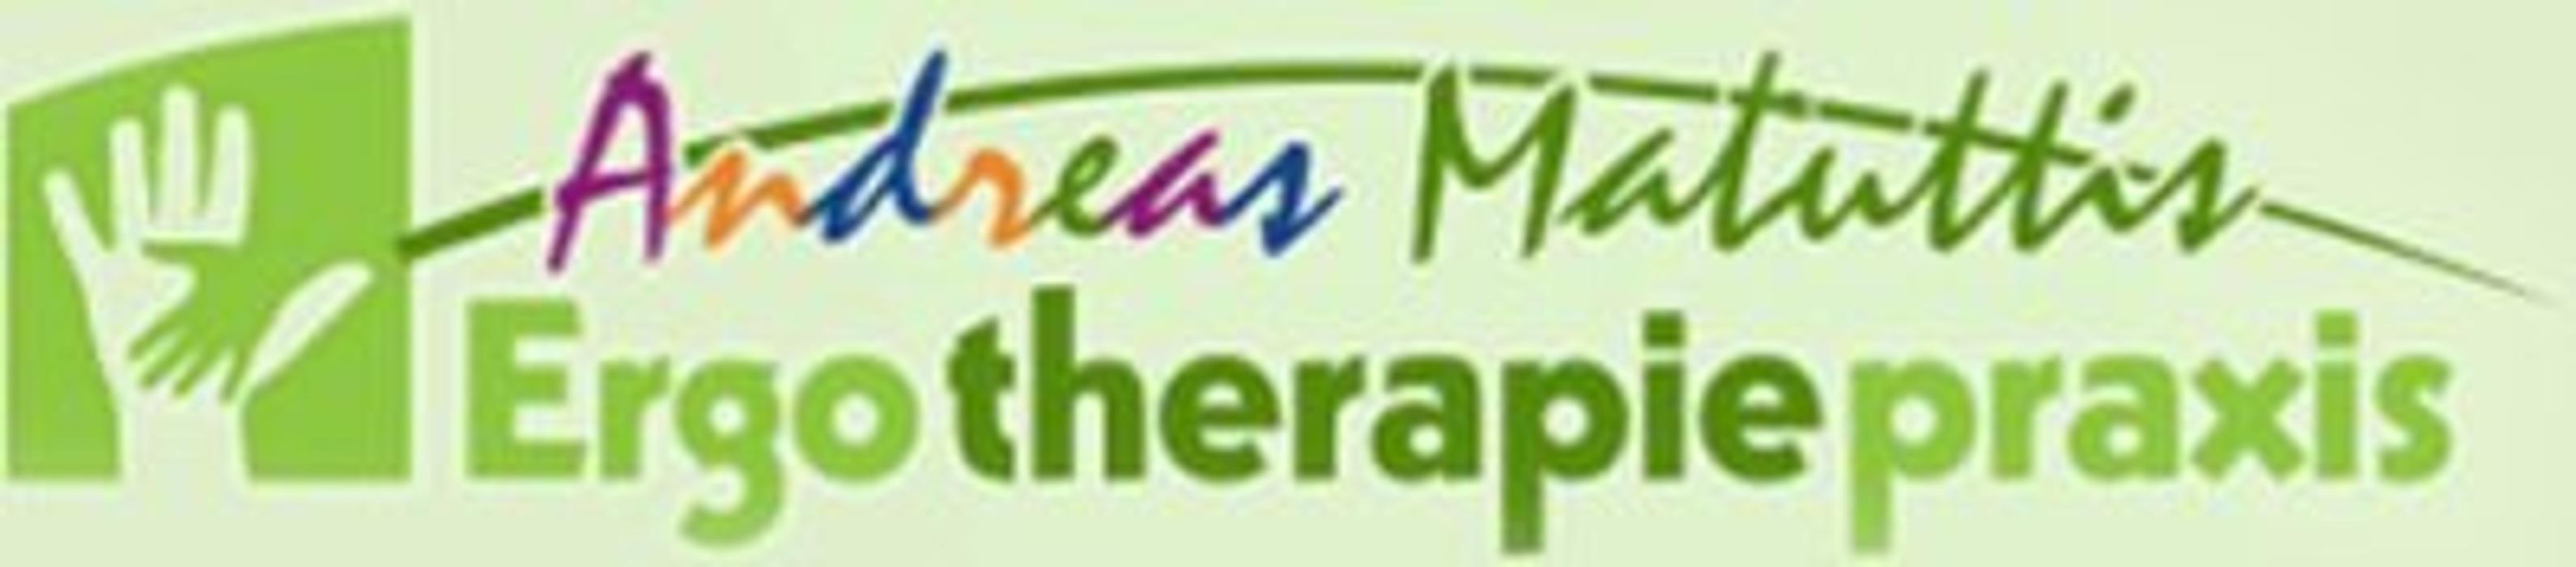 Bild zu Ergotherapie Praxis Andreas Matuttis in Tuttlingen